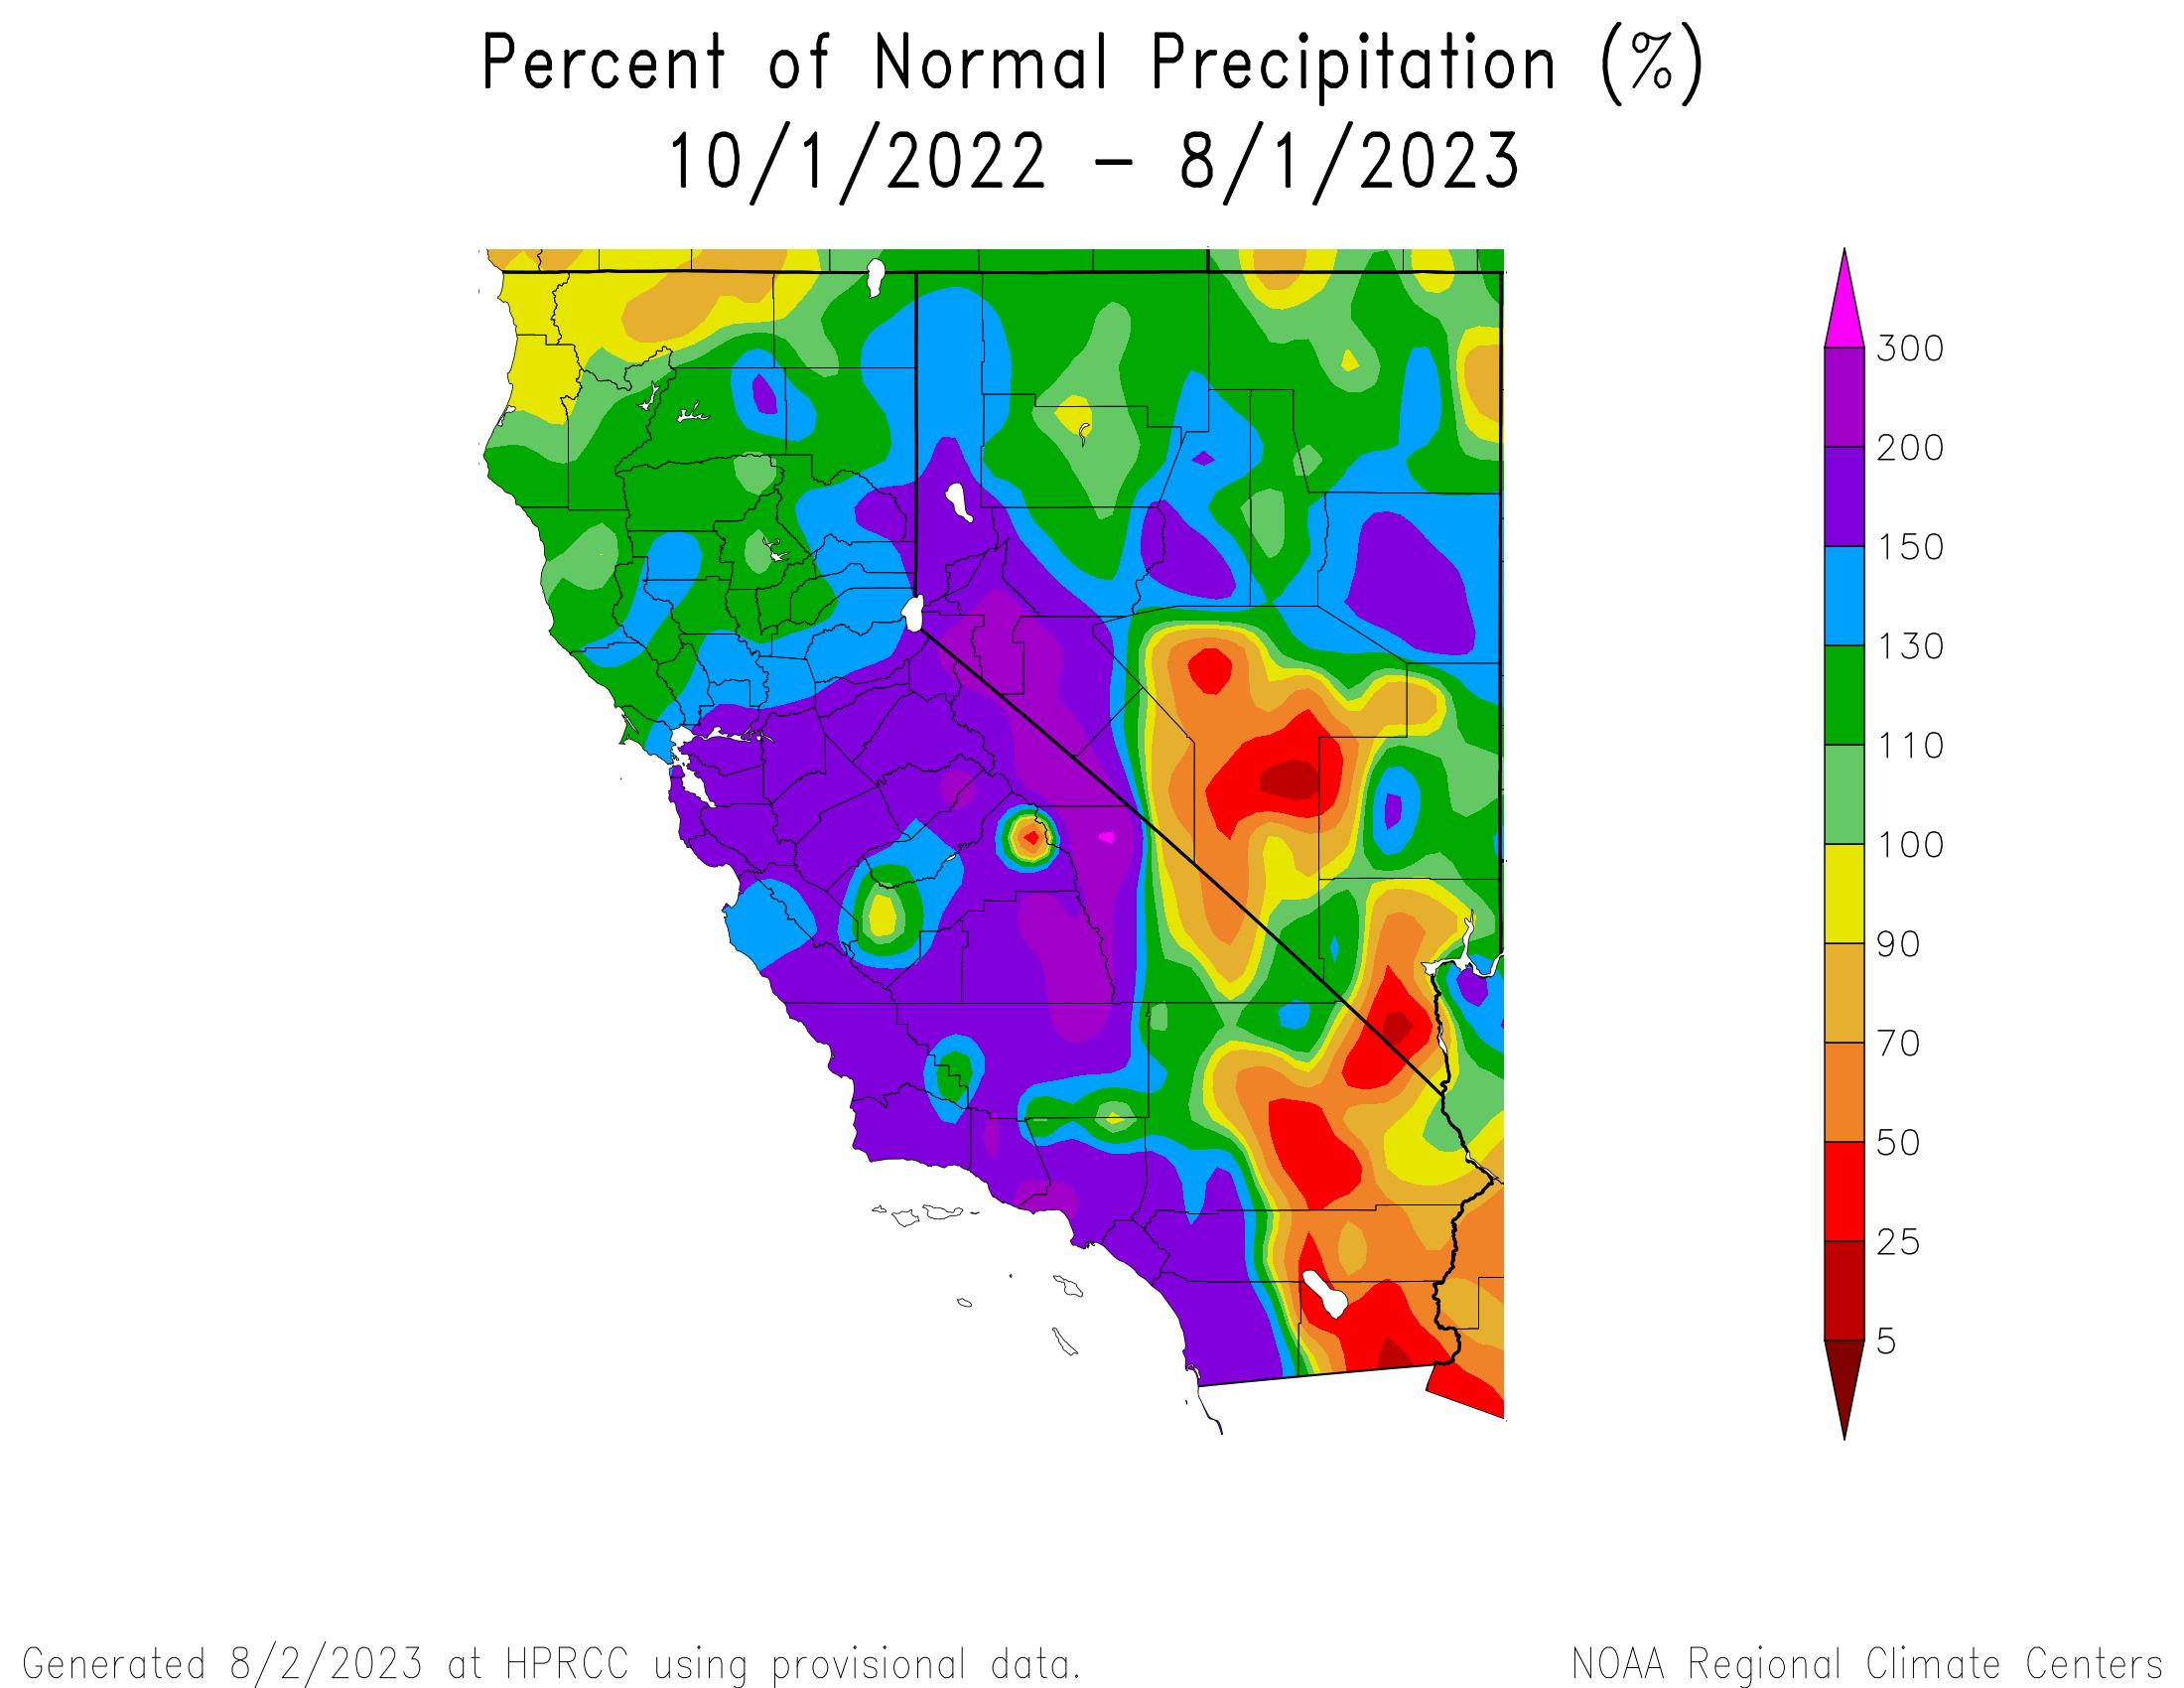 Percent of Normal Precipitation for California